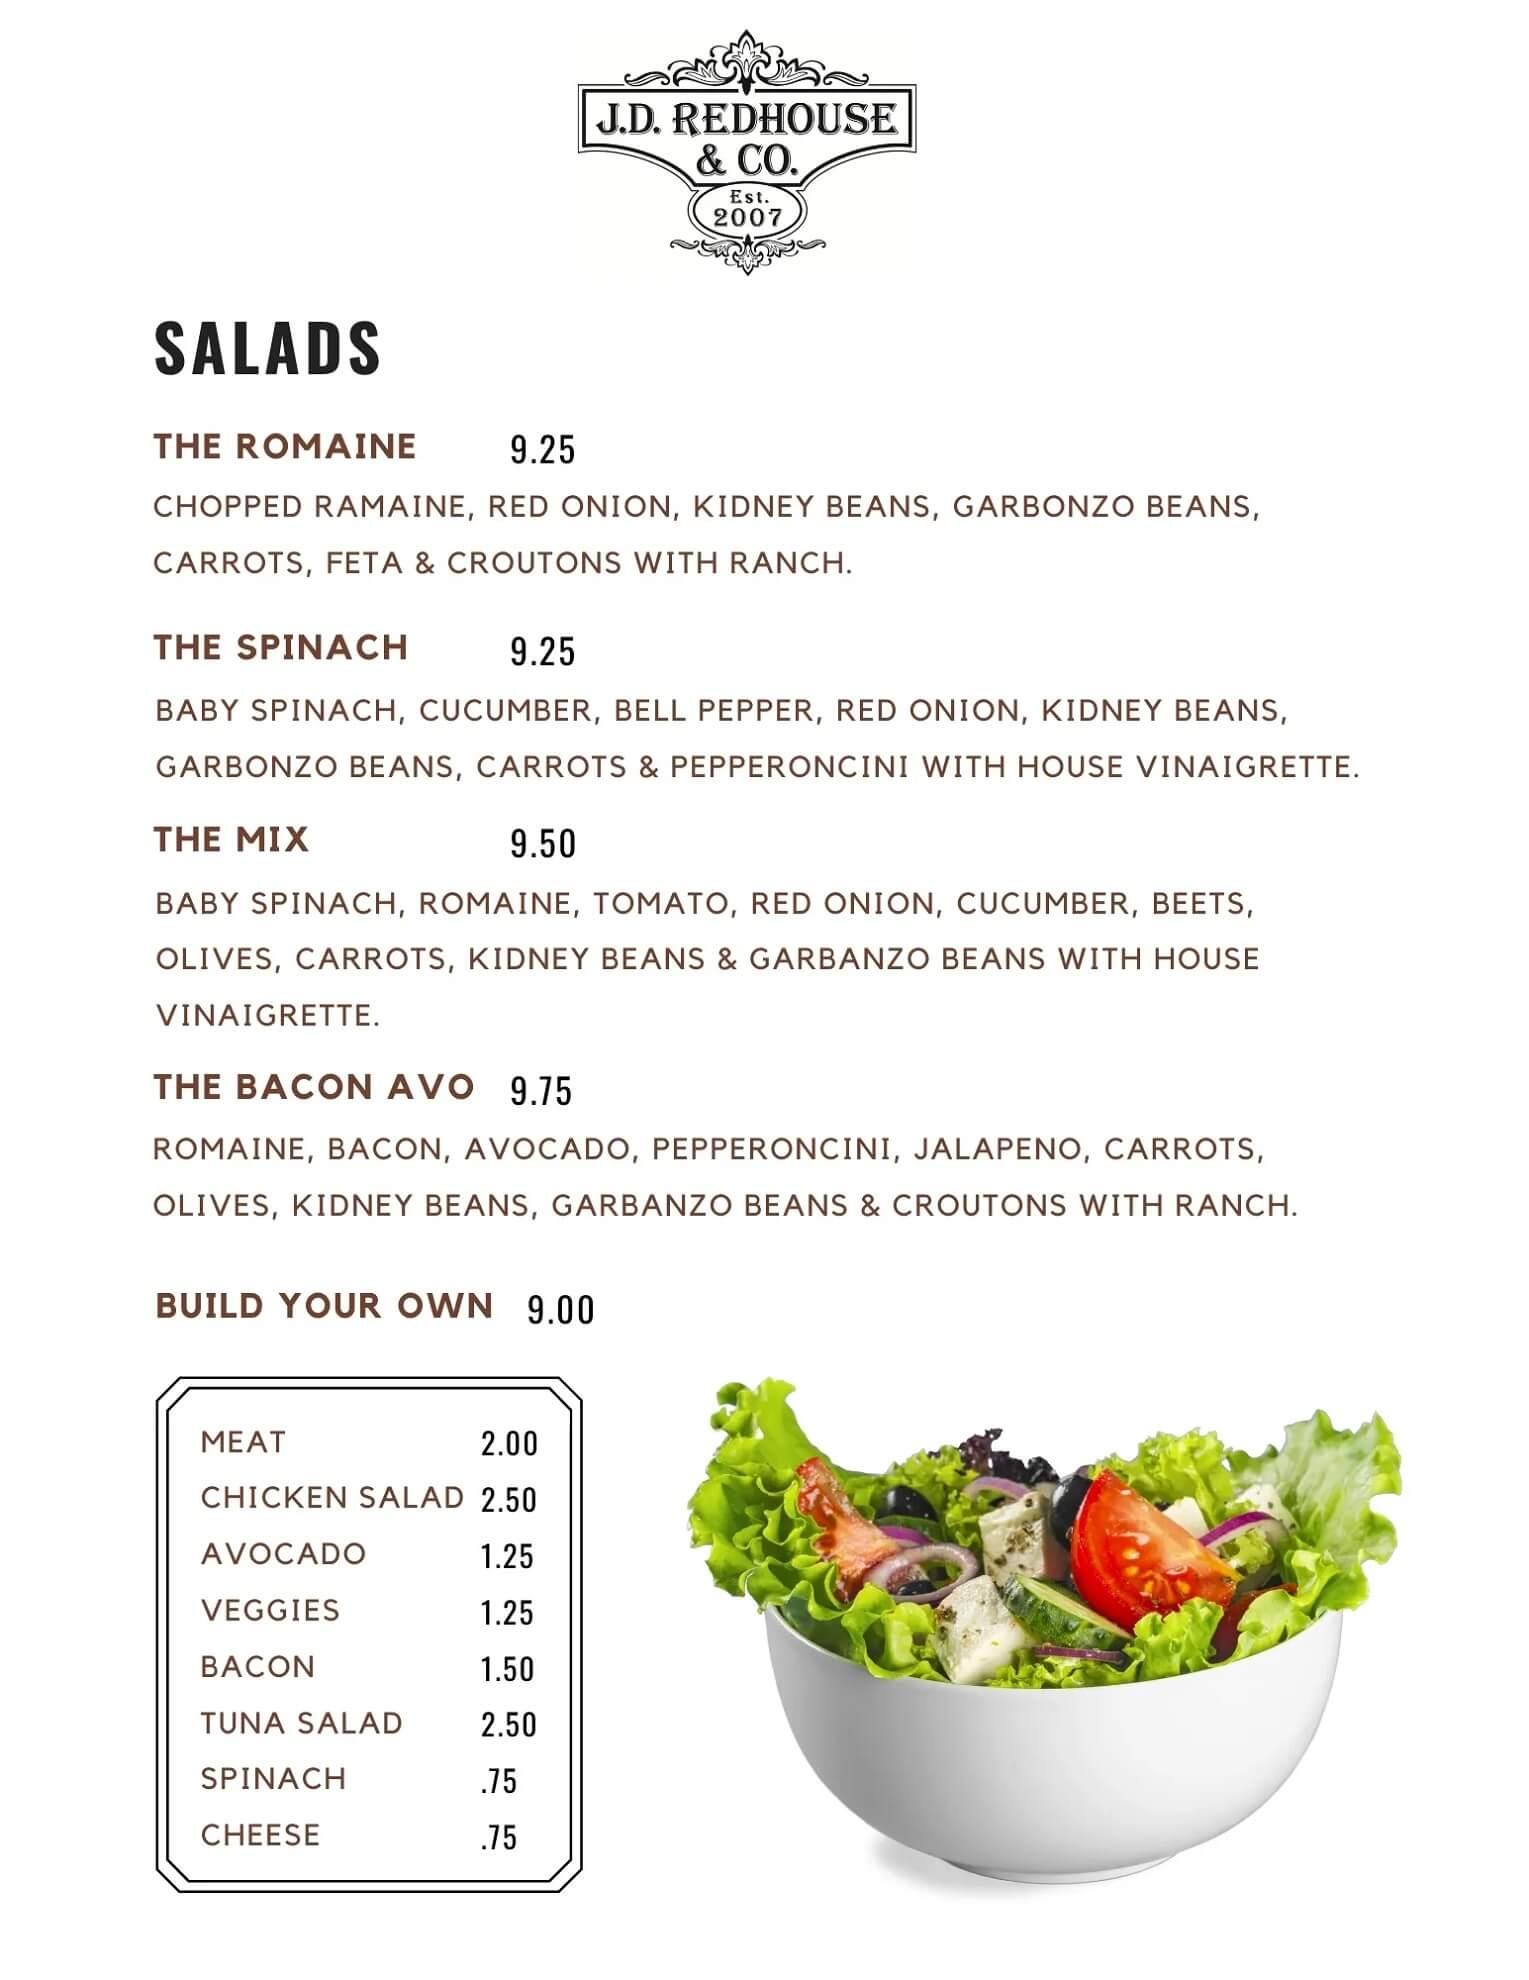 JD Redhouse Salad Menu - Willits California